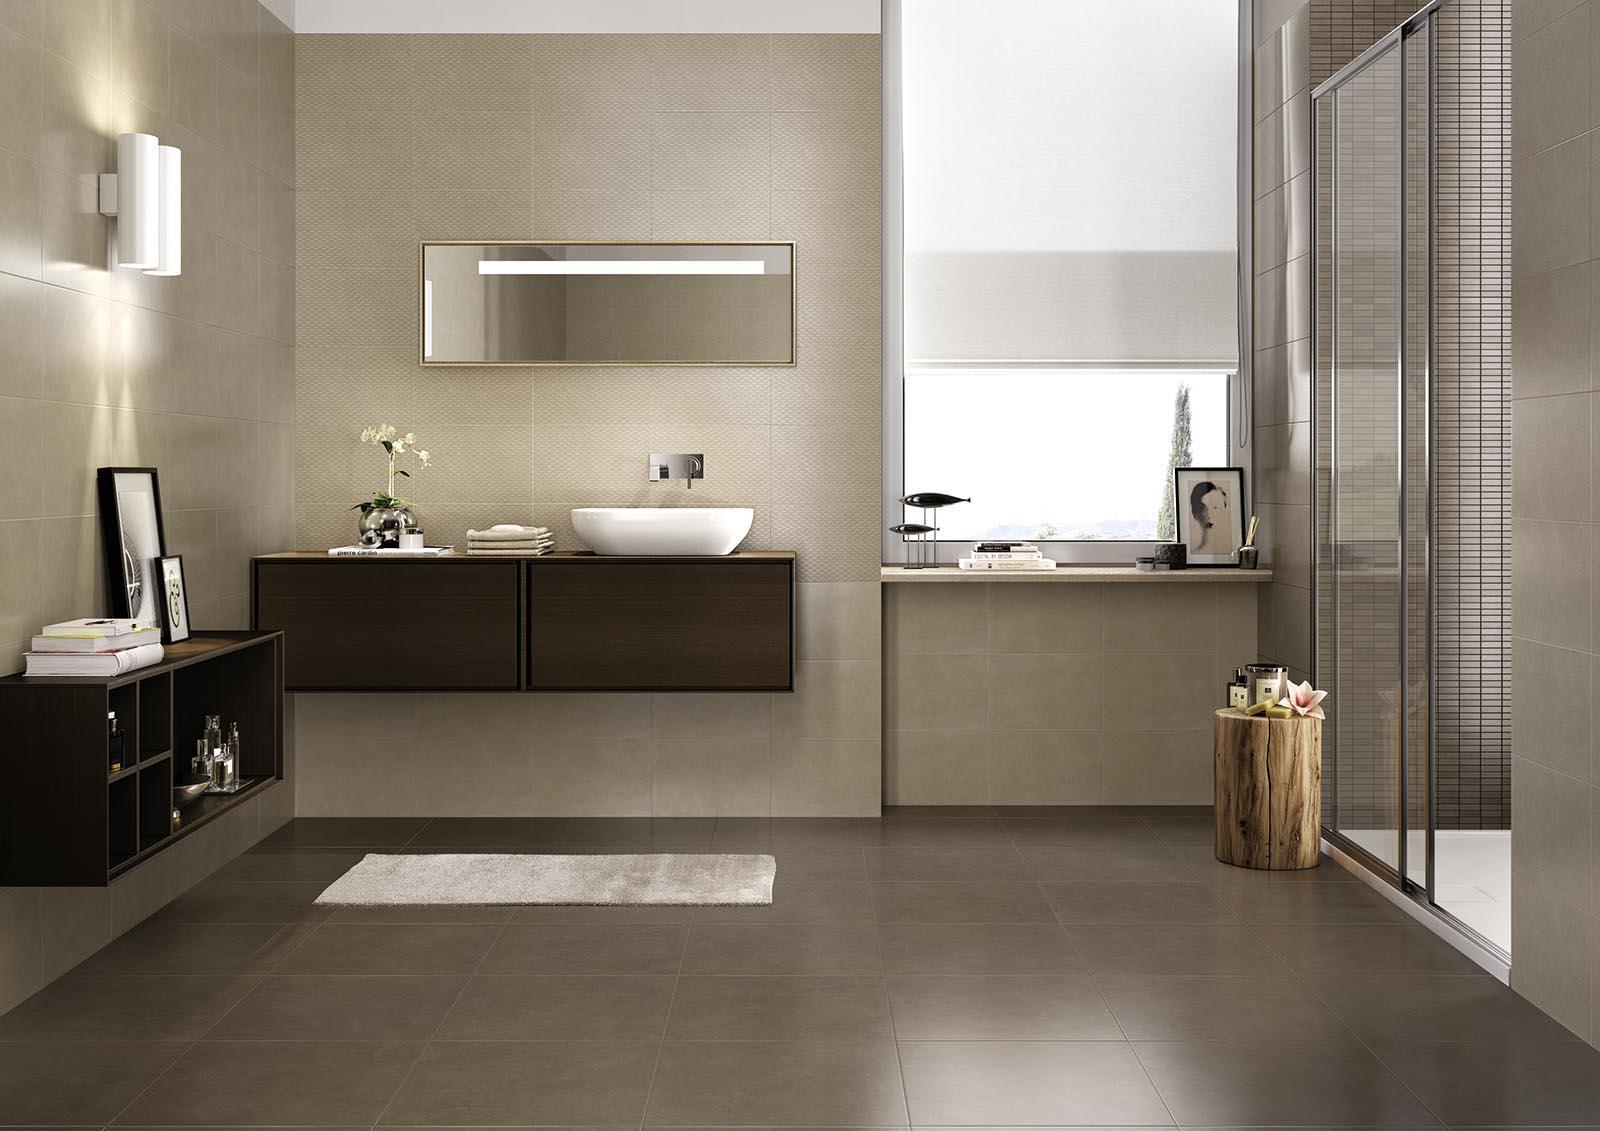 progress gr s c rame effet naturel marazzi. Black Bedroom Furniture Sets. Home Design Ideas